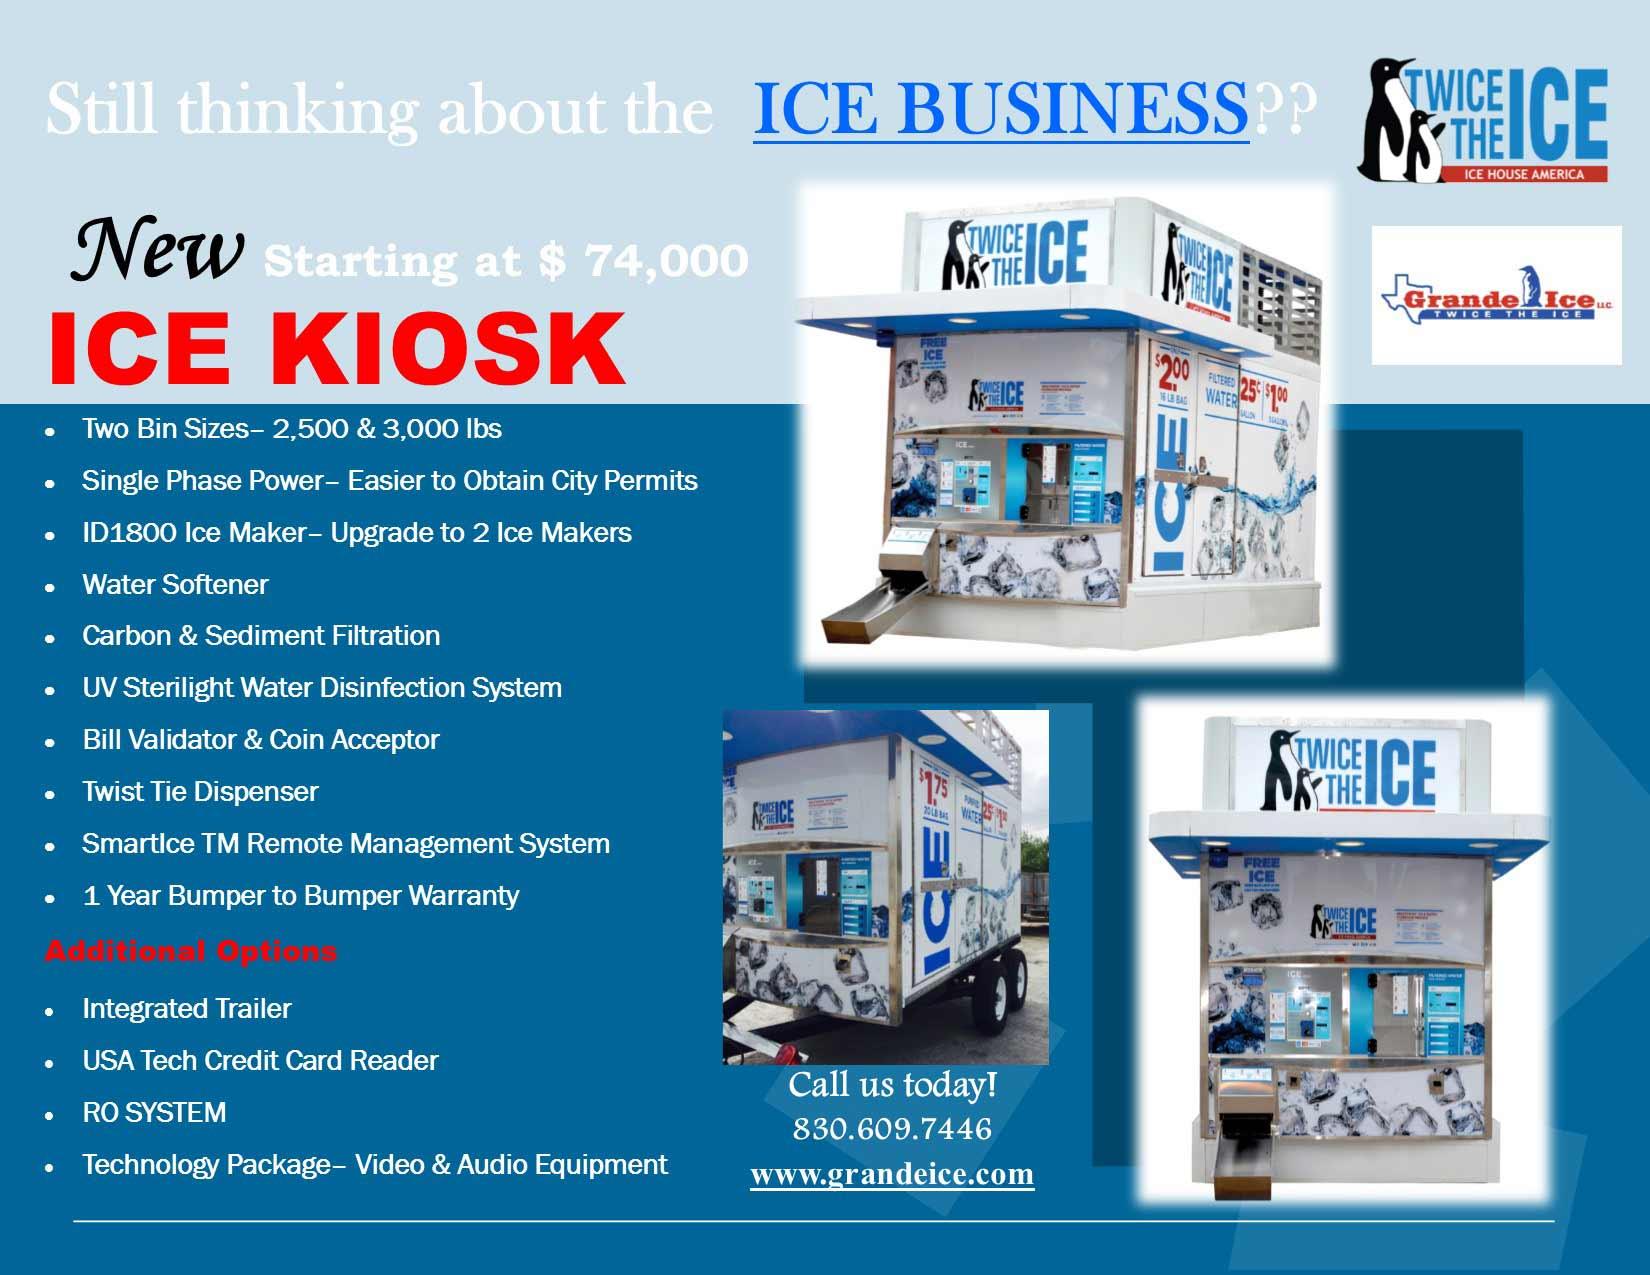 ICE KIOSK- 6.7' W x 12'D x 10.3' H 6.7'W x 16' D x 10.3'H 2,500 /3,000 LBS OF ICE